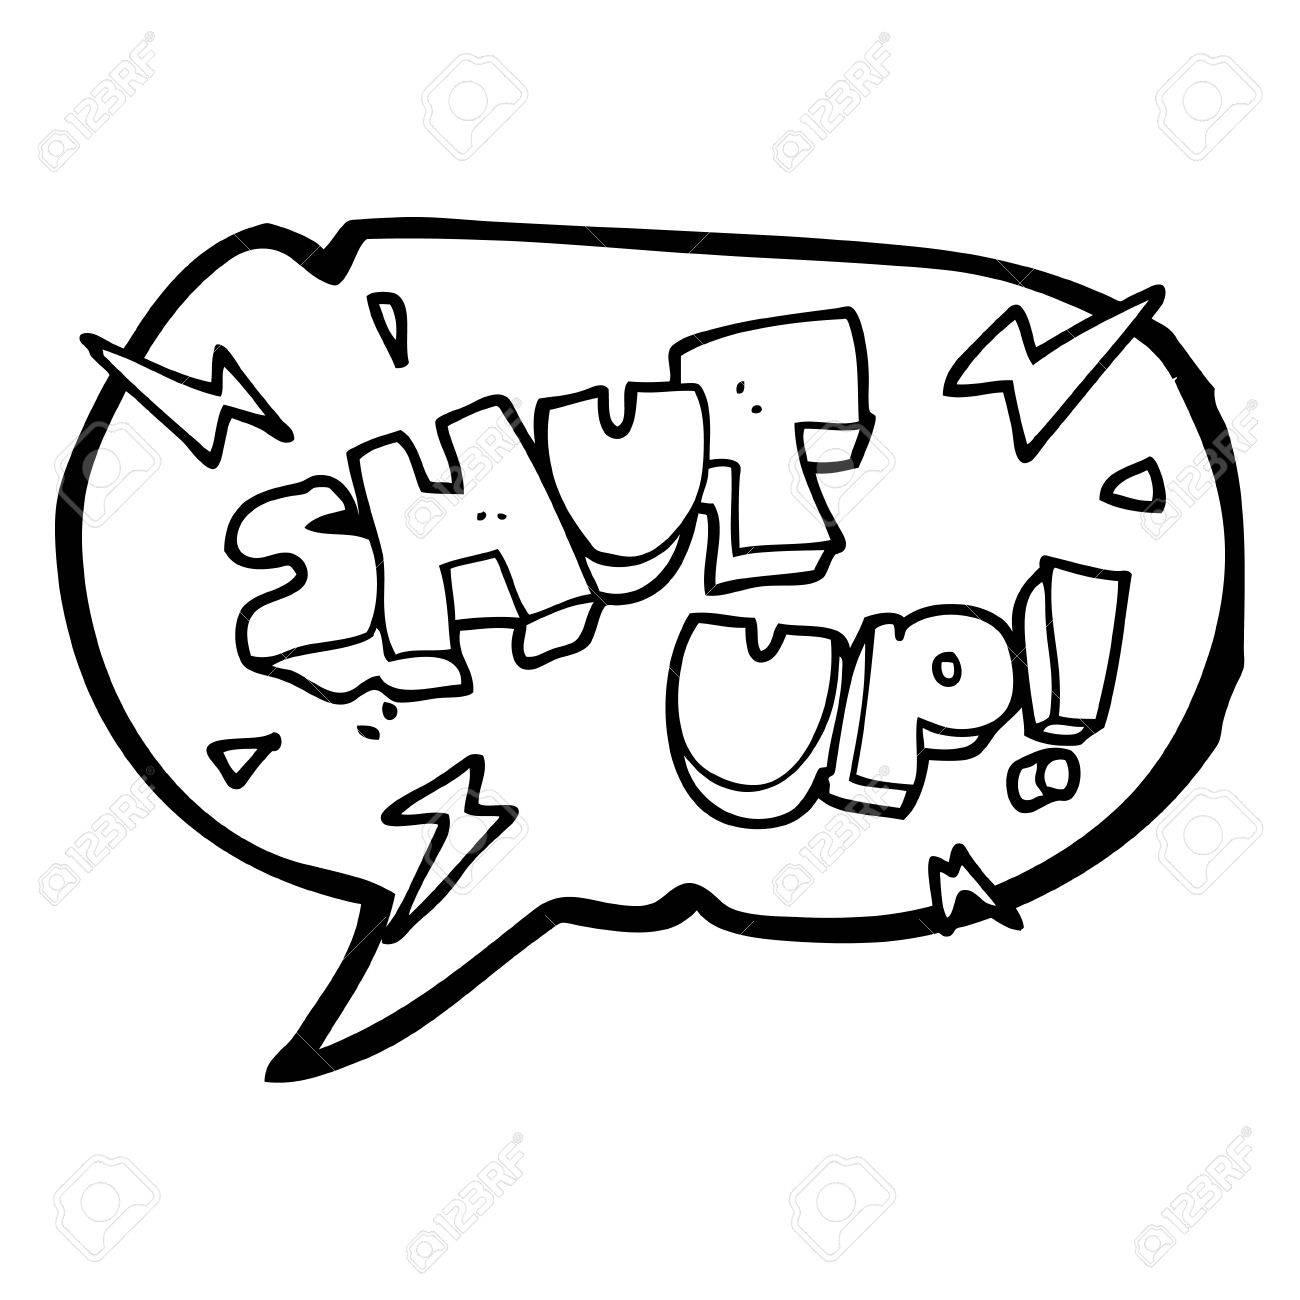 1300x1300 Freehand Drawn Speech Bubble Cartoon Shut Up! Symbol Royalty Free